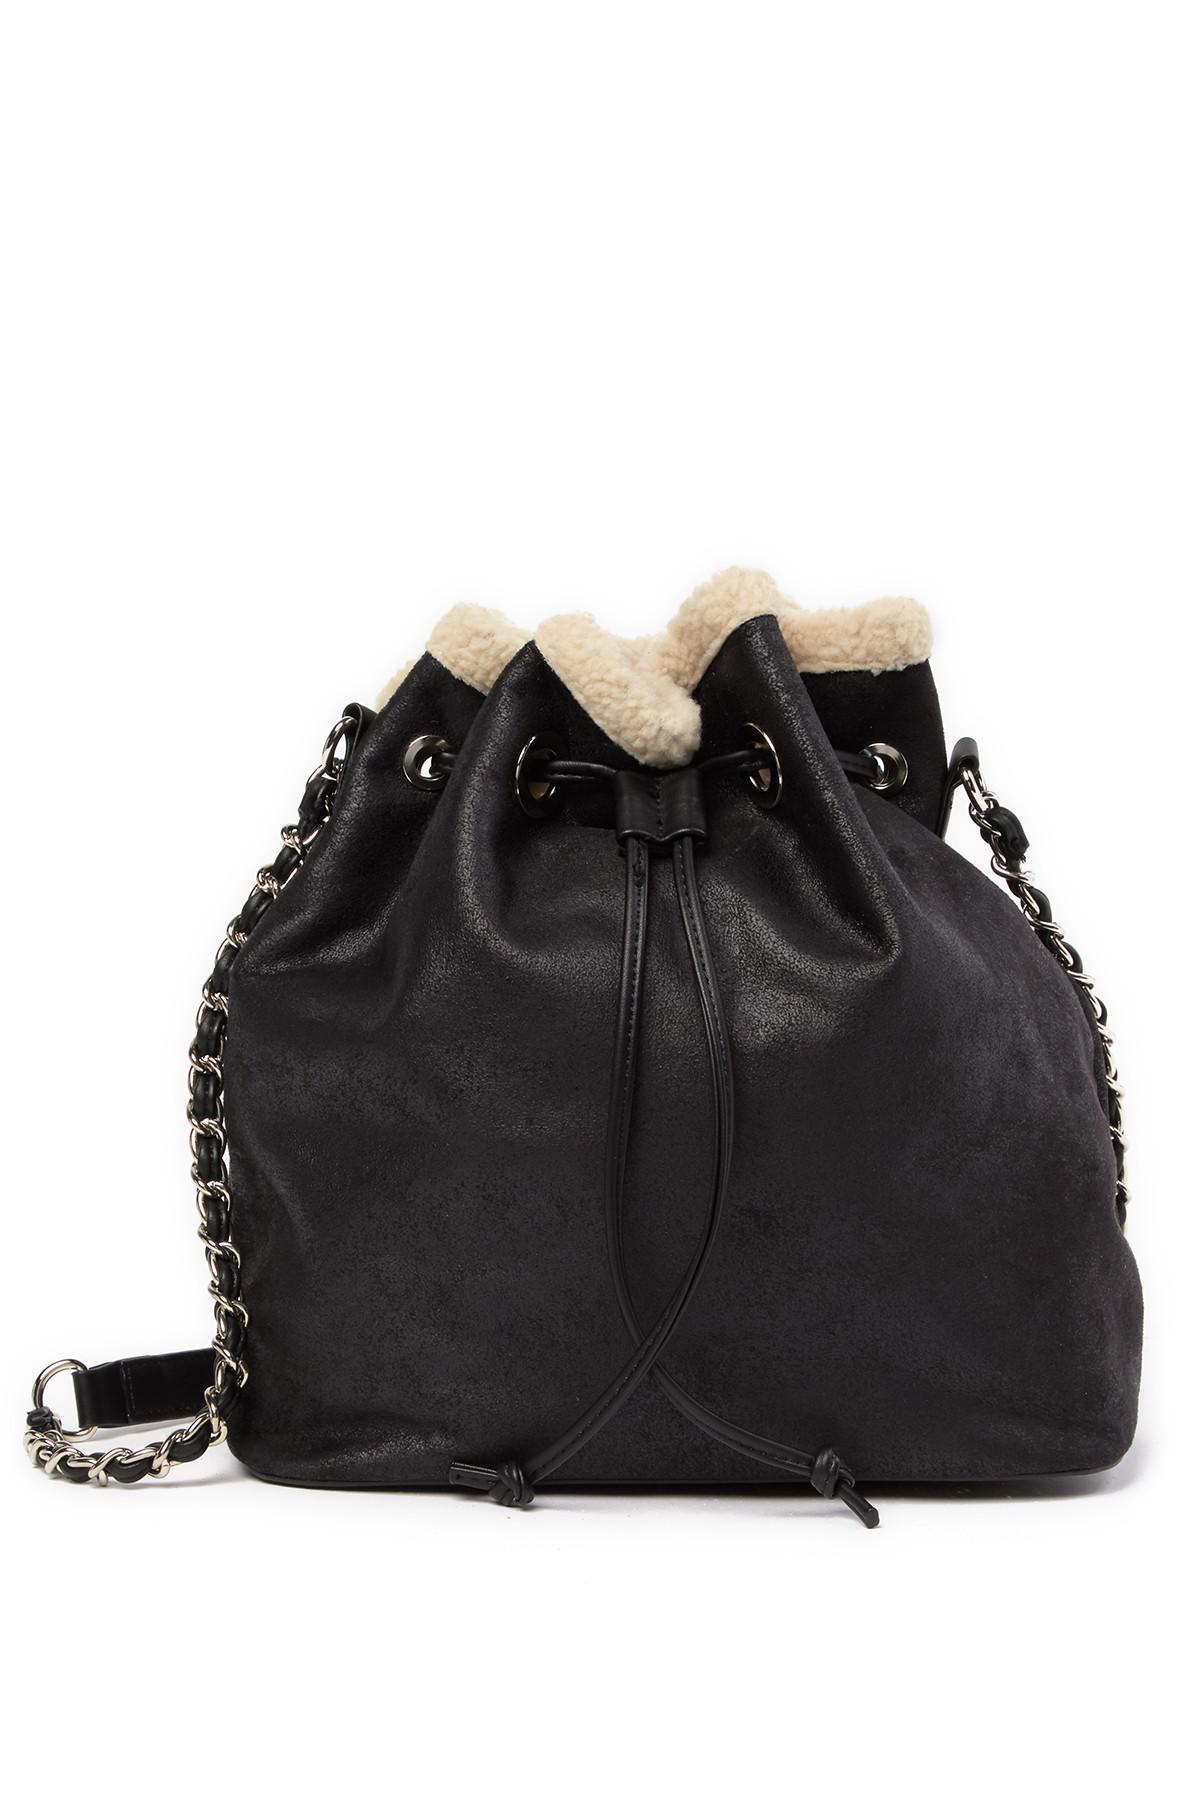 96e9ebf4bc Lyst - Steve Madden Bucket Faux Fur Lined Shoulder Bag in Natural